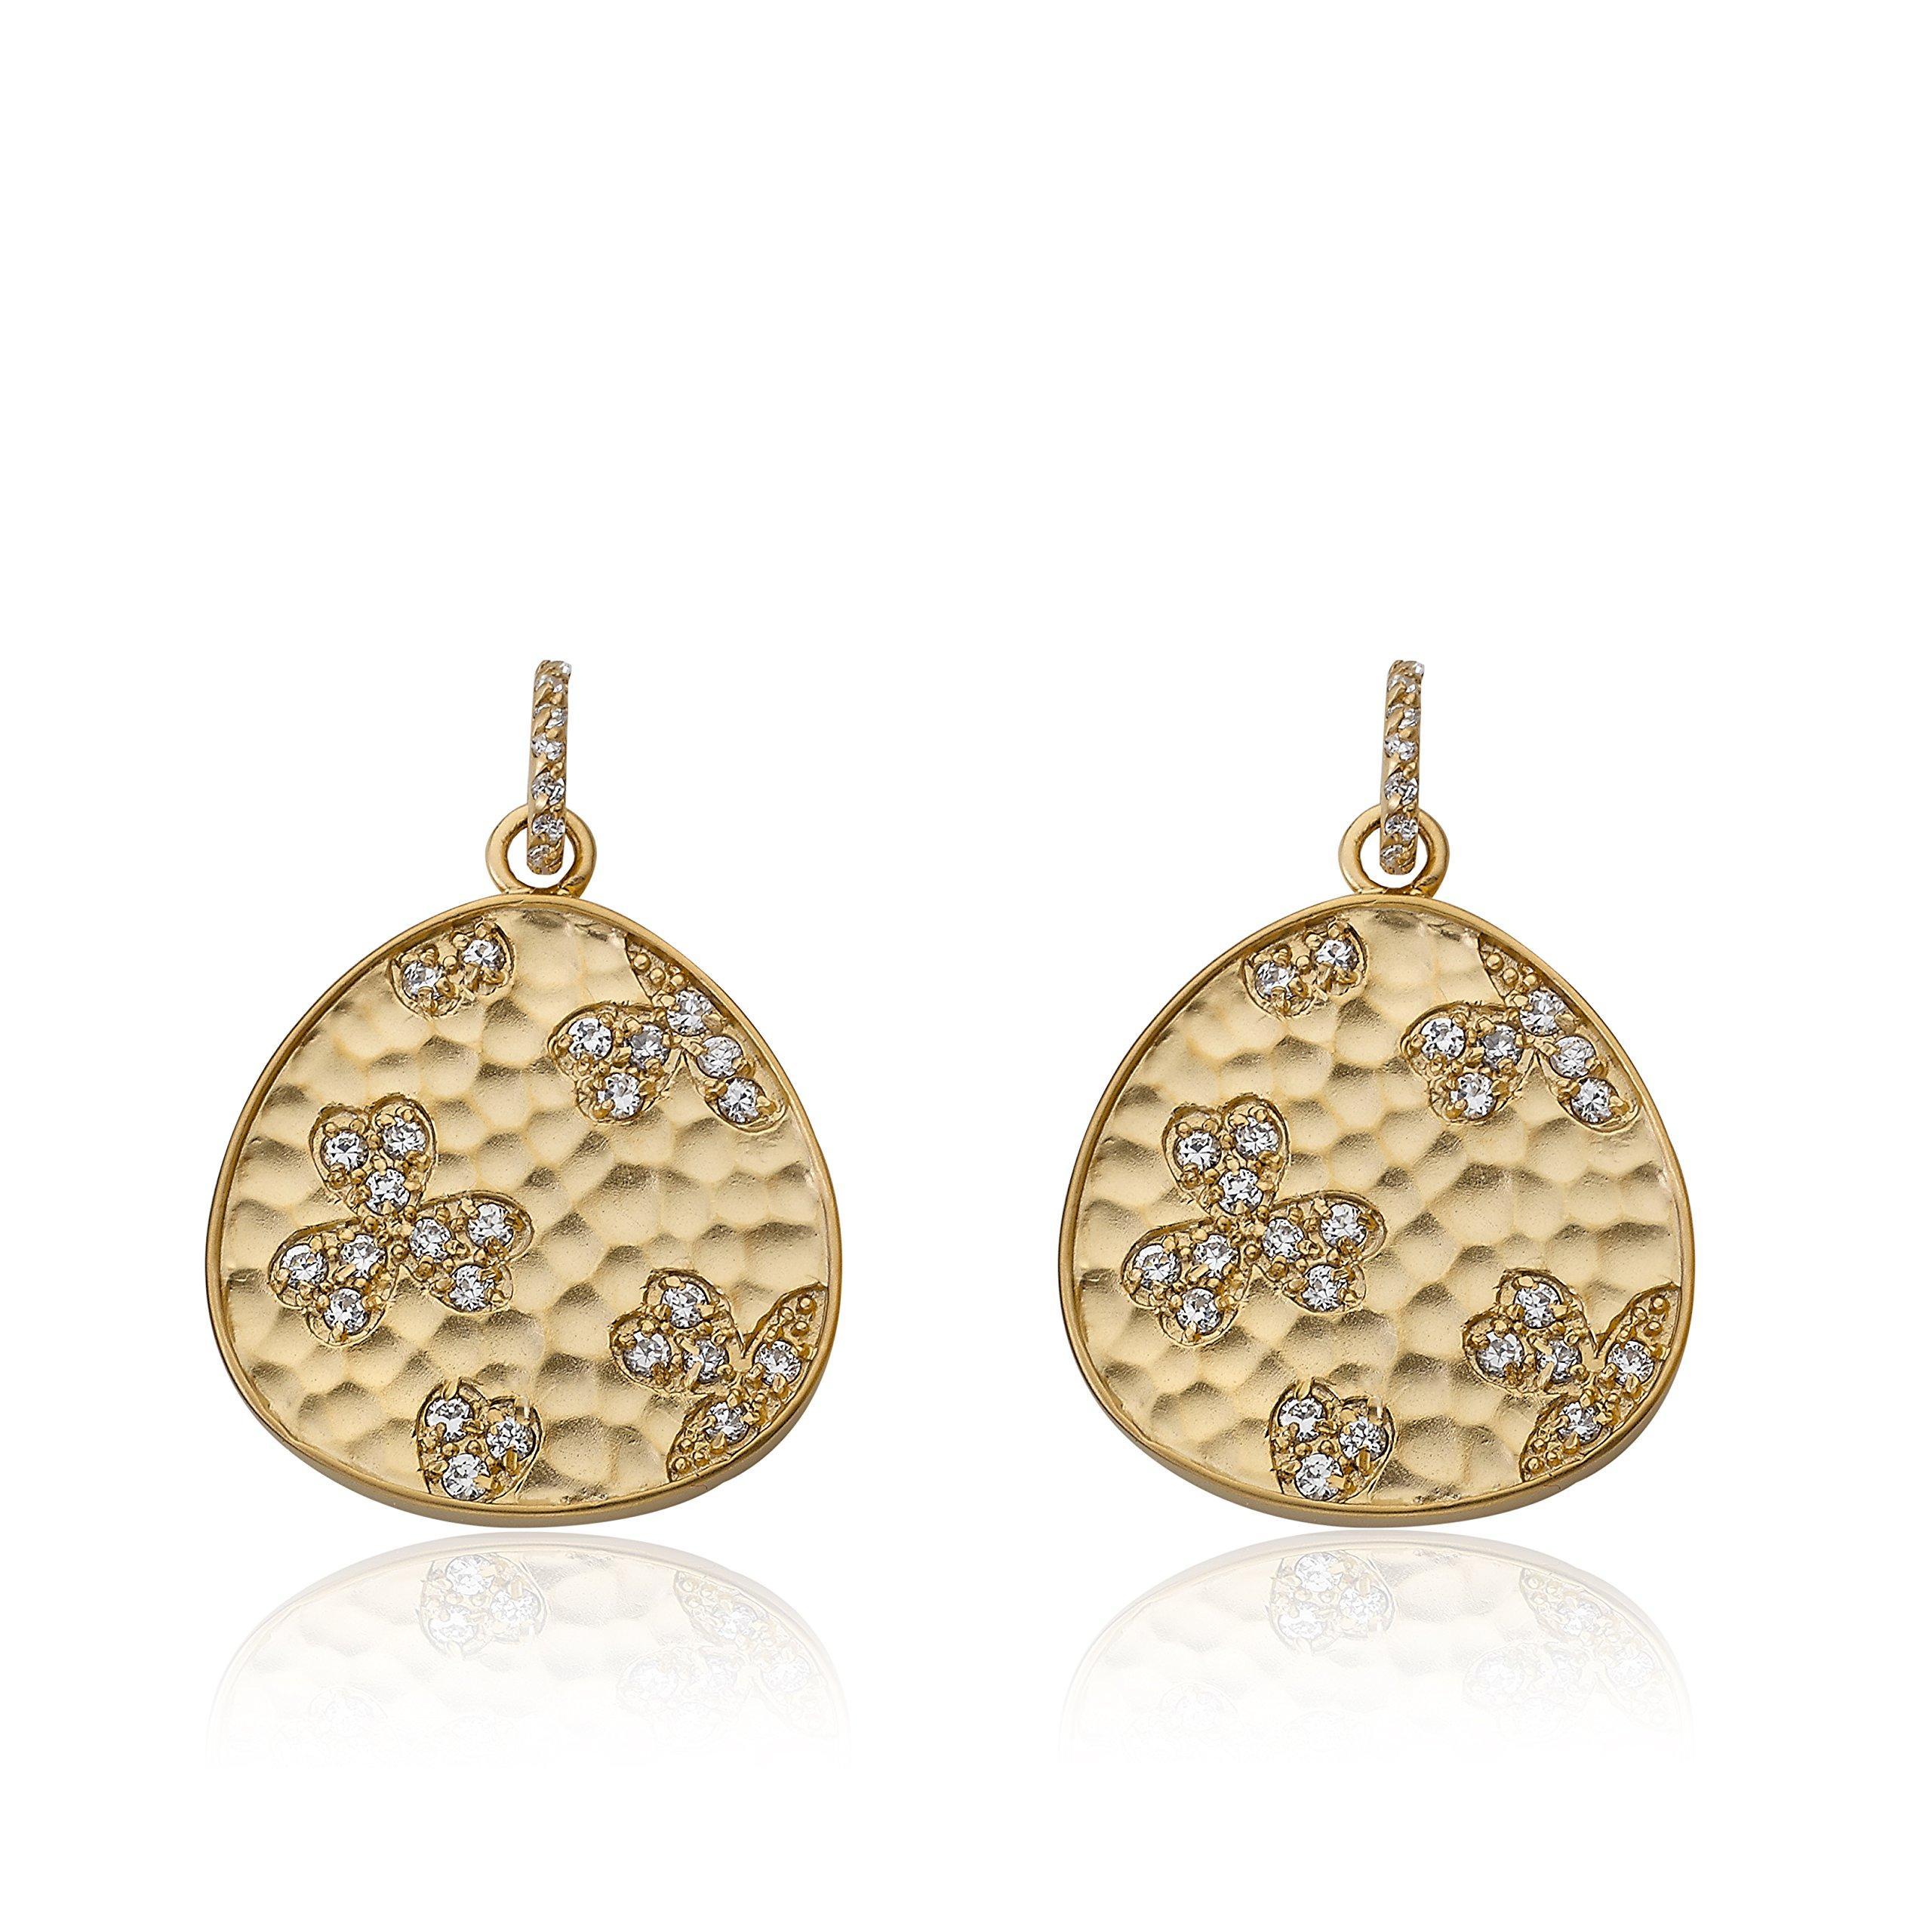 Riccova Retro Satin Hammered 14k Gold-Plated Cubic Zirconia Leaf Design In Teardrop Dangle Earring